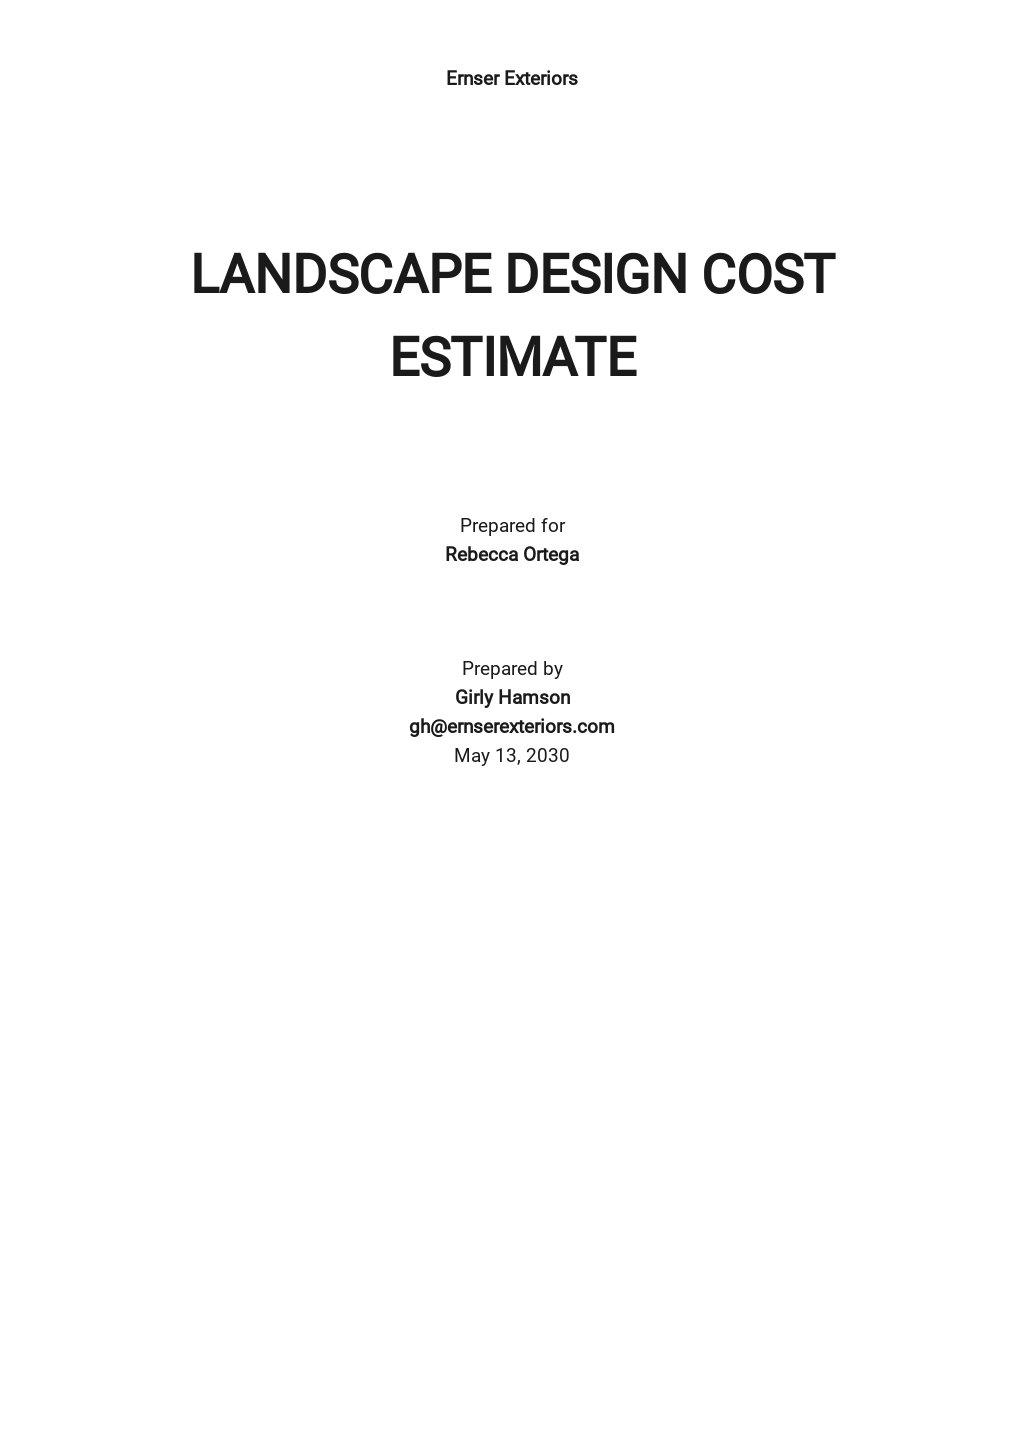 Landscape Design Cost Estimate Template